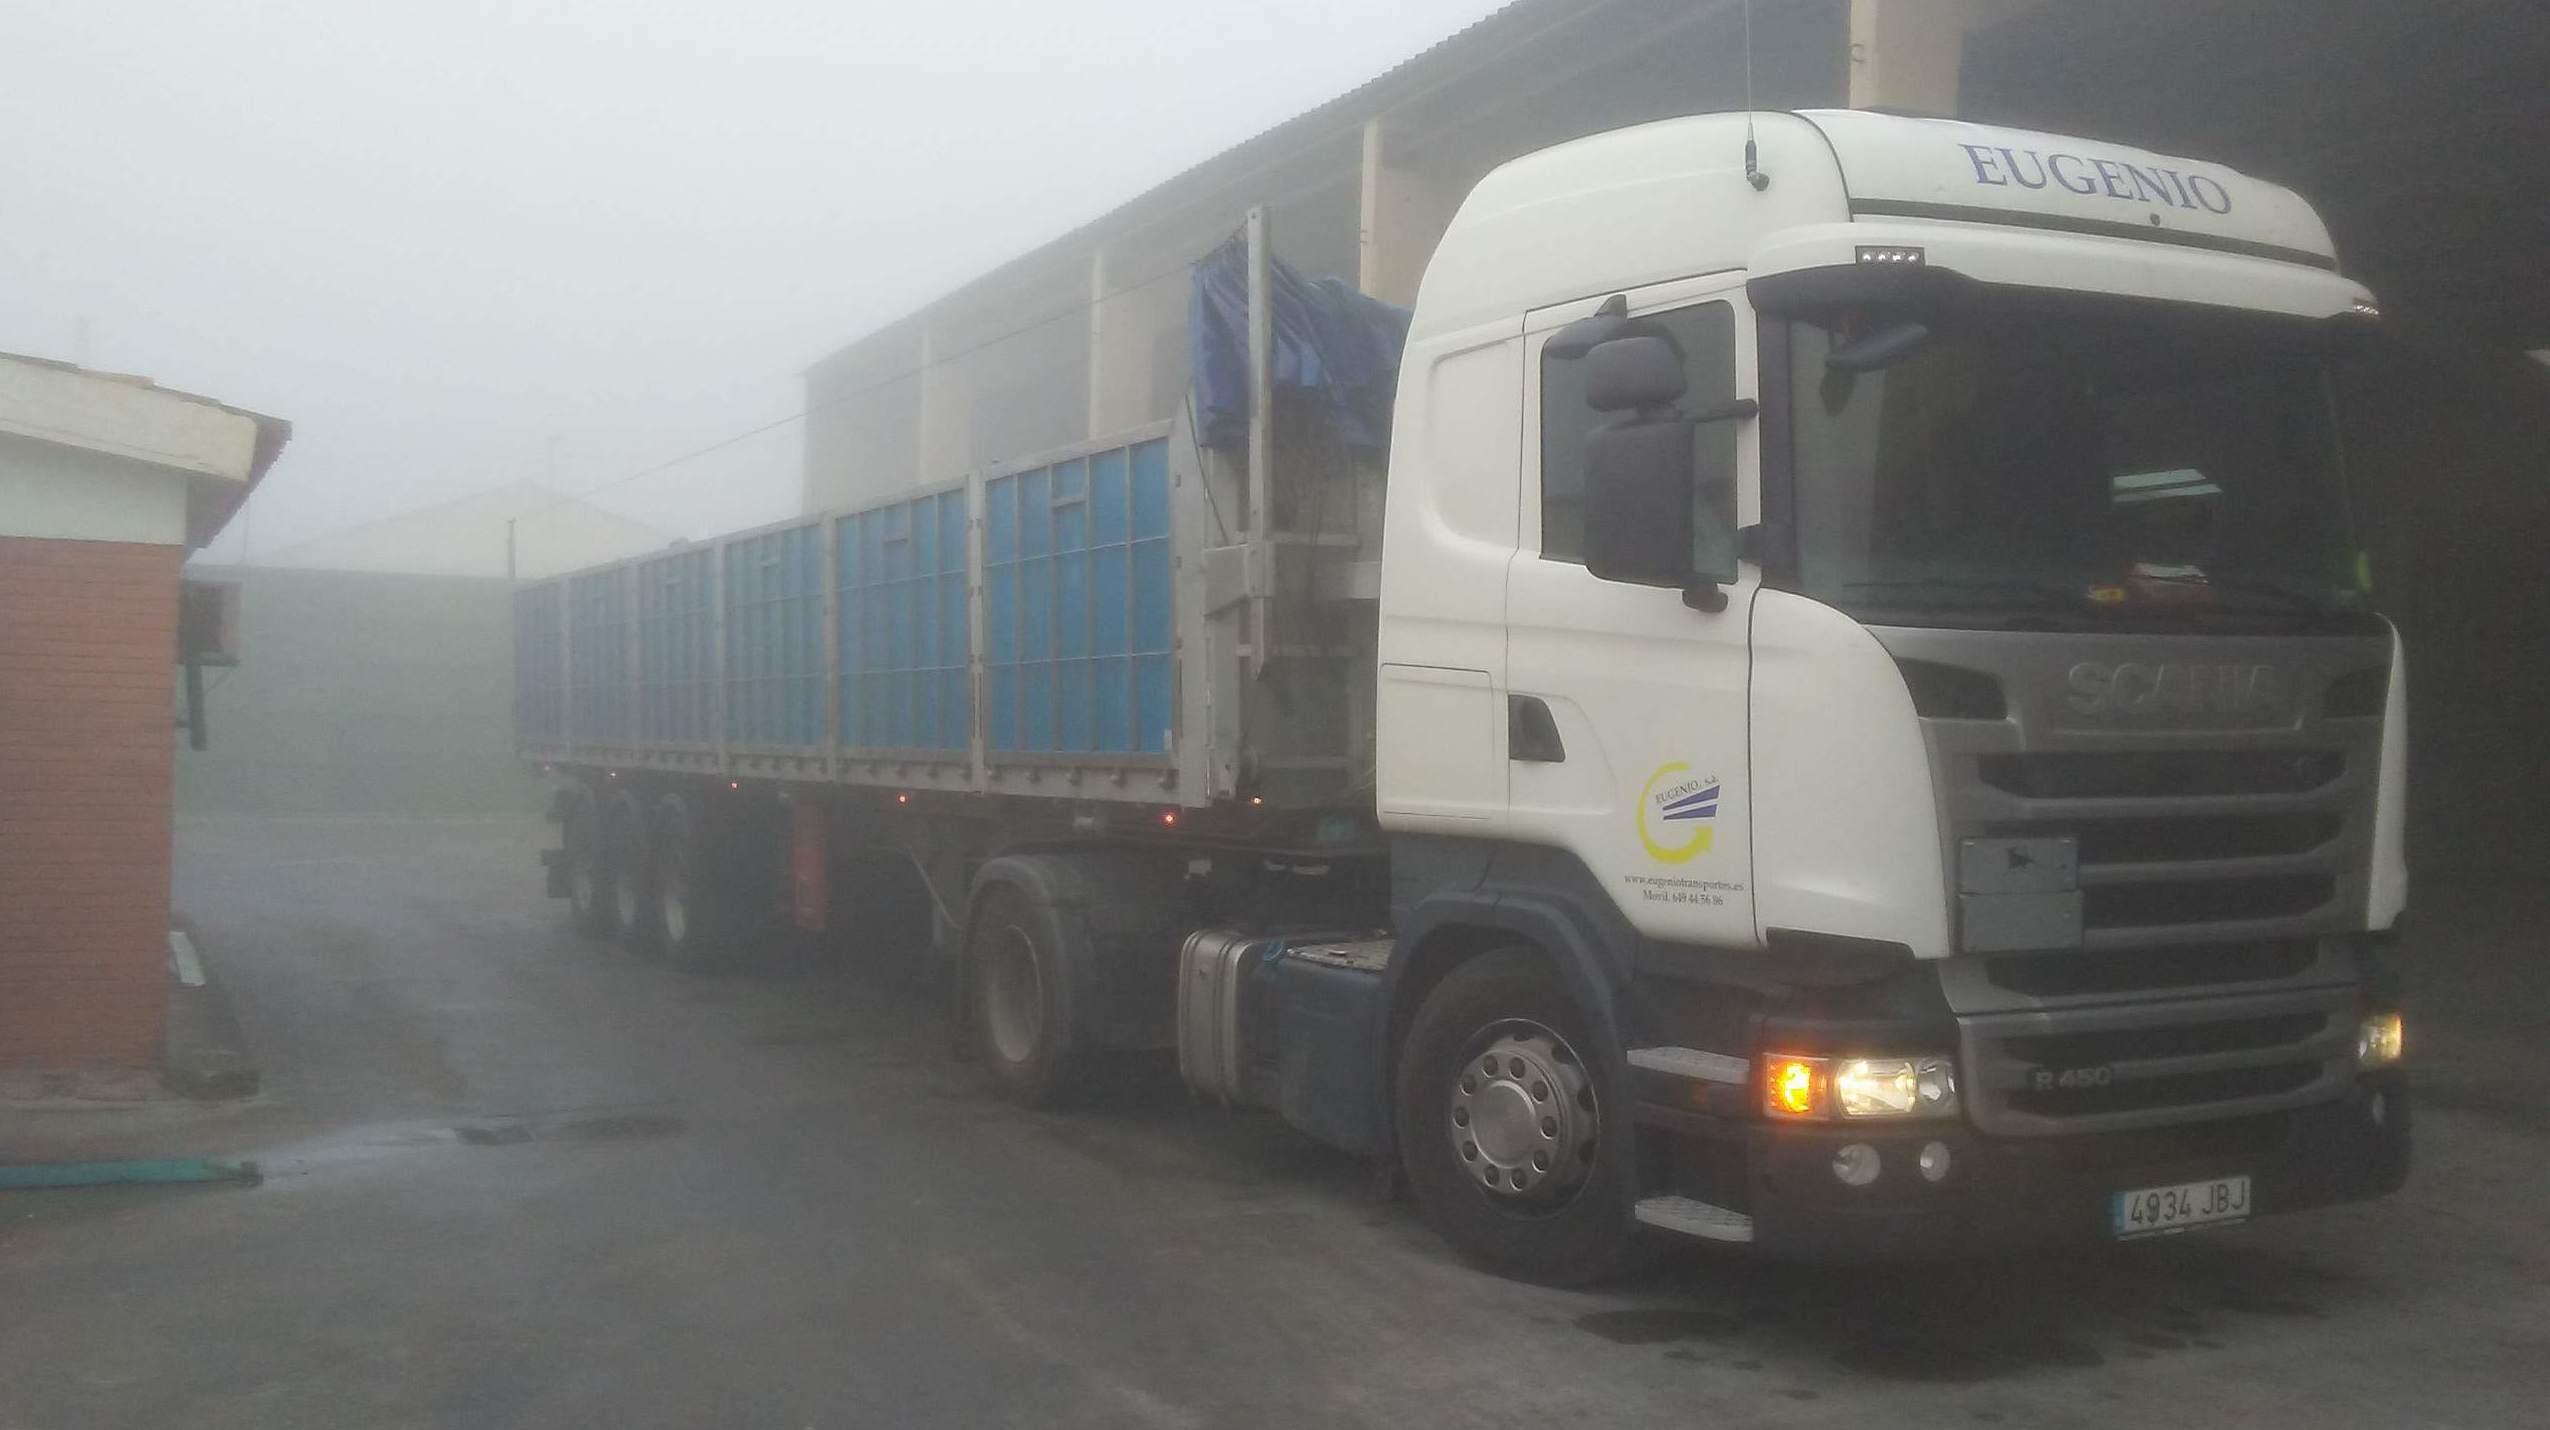 Foto 1 de Transporte de mercancías en Ribesalbes | EUGENIO, S. A.